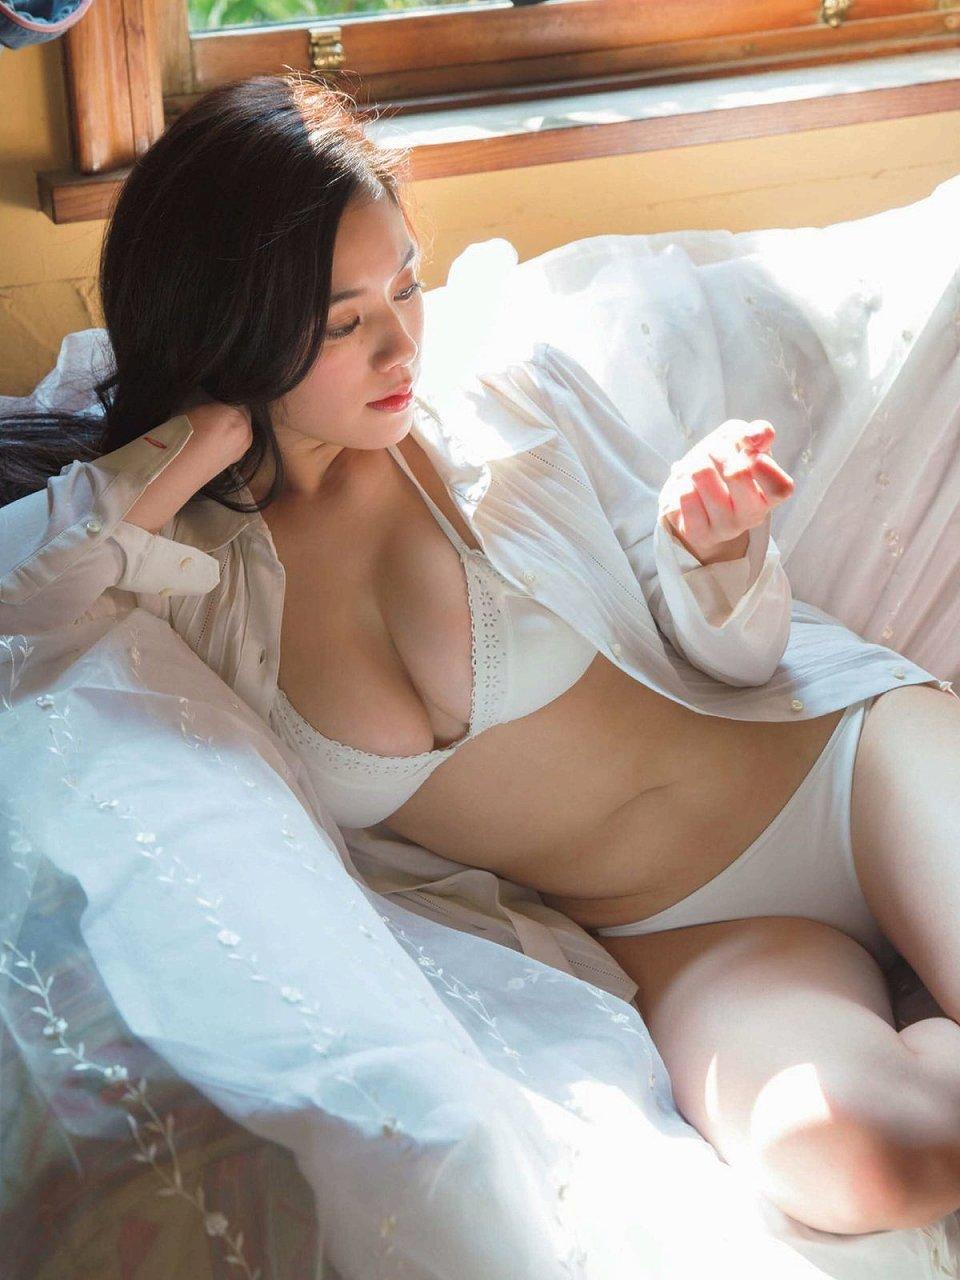 「FRIDAY(フライデー) 2016年 8/5 号」筧美和子の水着グラビア